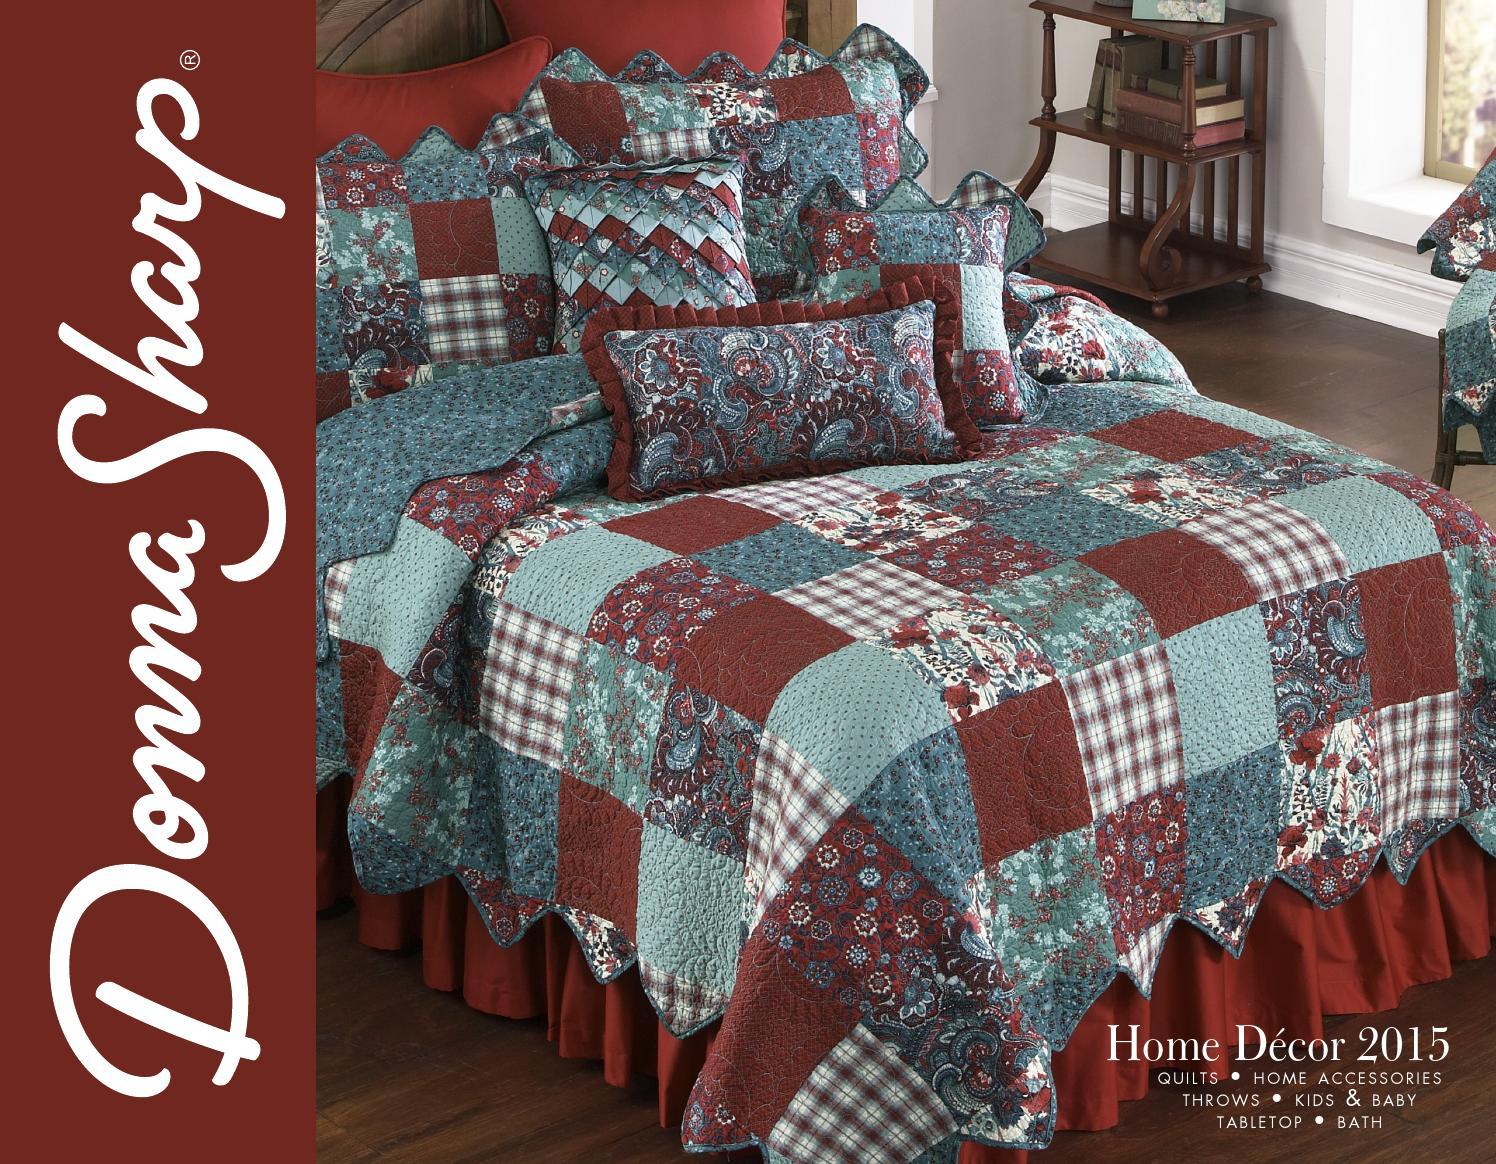 2015 Home D Cor Catalog By Donna Sharp Inc Issuu